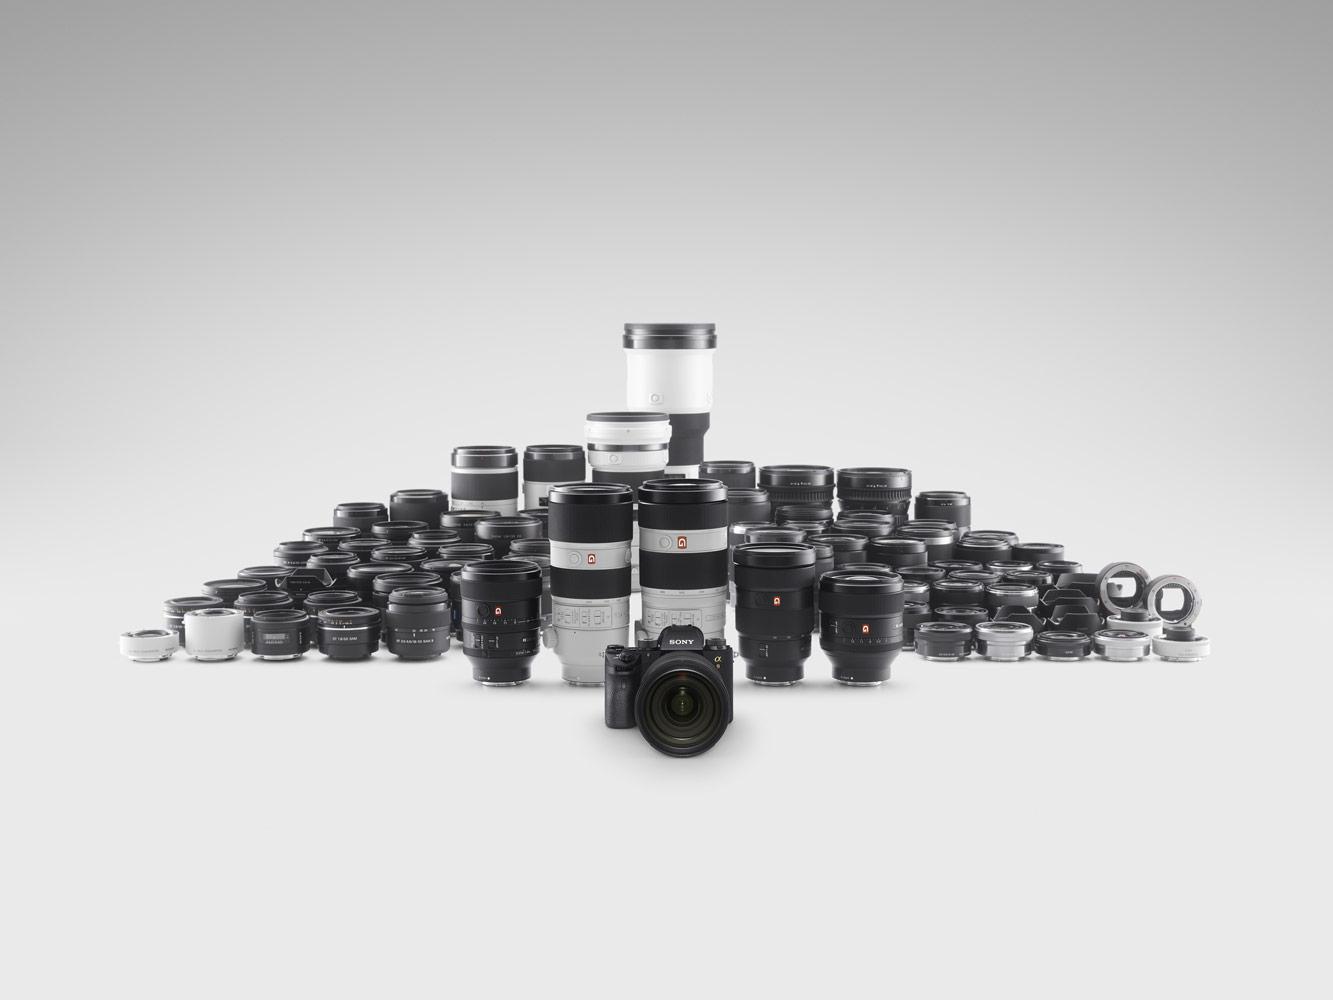 Sony Kamera Lineup